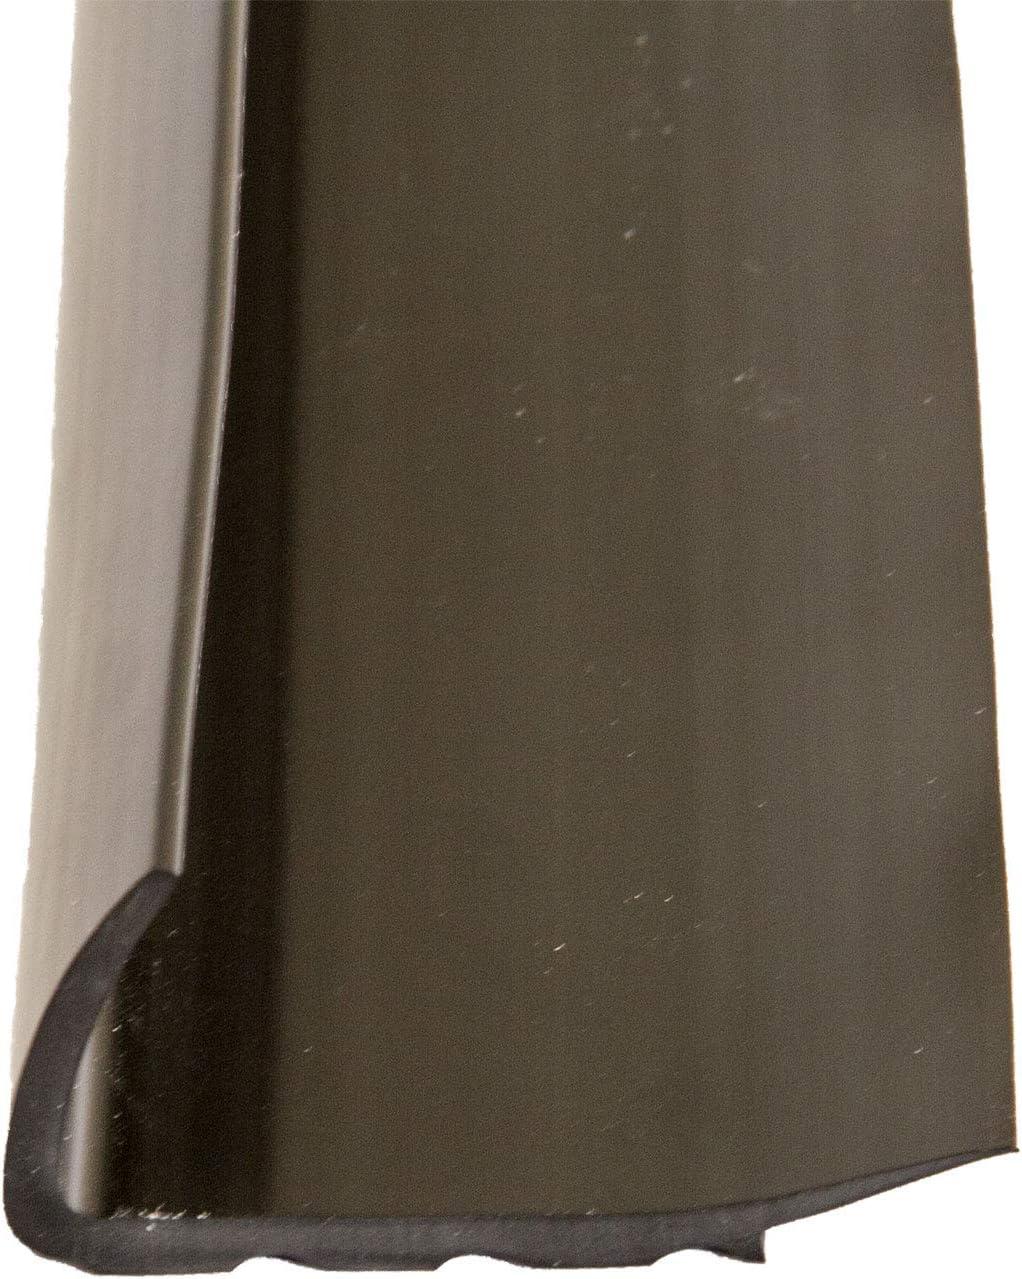 Treppenkantenprofil aus Kunststoff rutschhemmendes Treppenprofil Winkelprofil f/ür Treppenstufe schwarz L/änge 110 cm 1